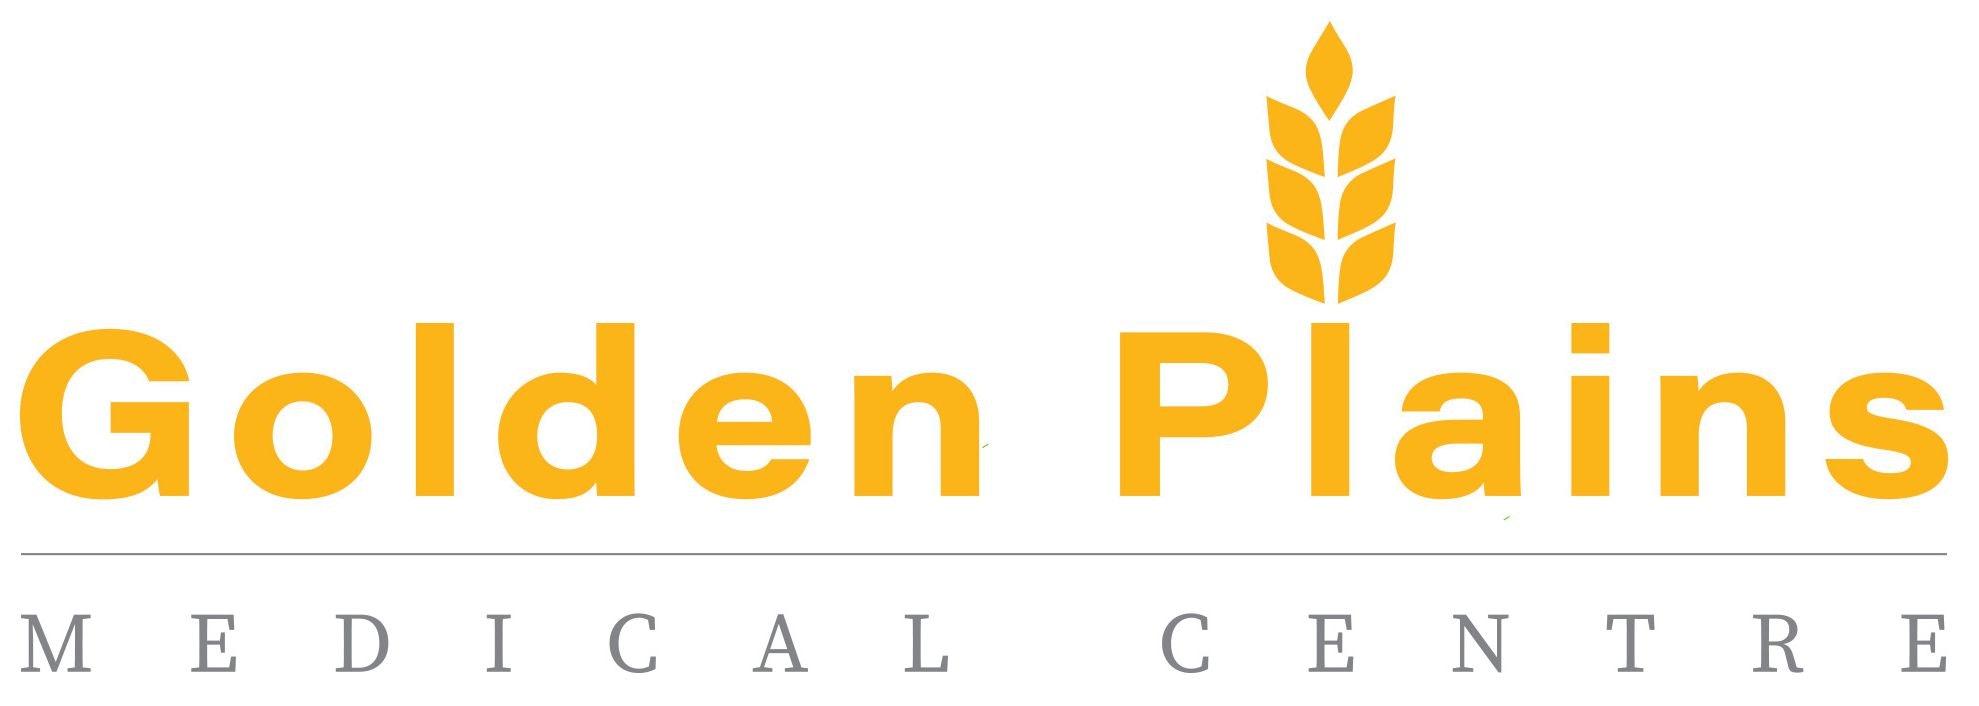 Golden Plains Medical Centre